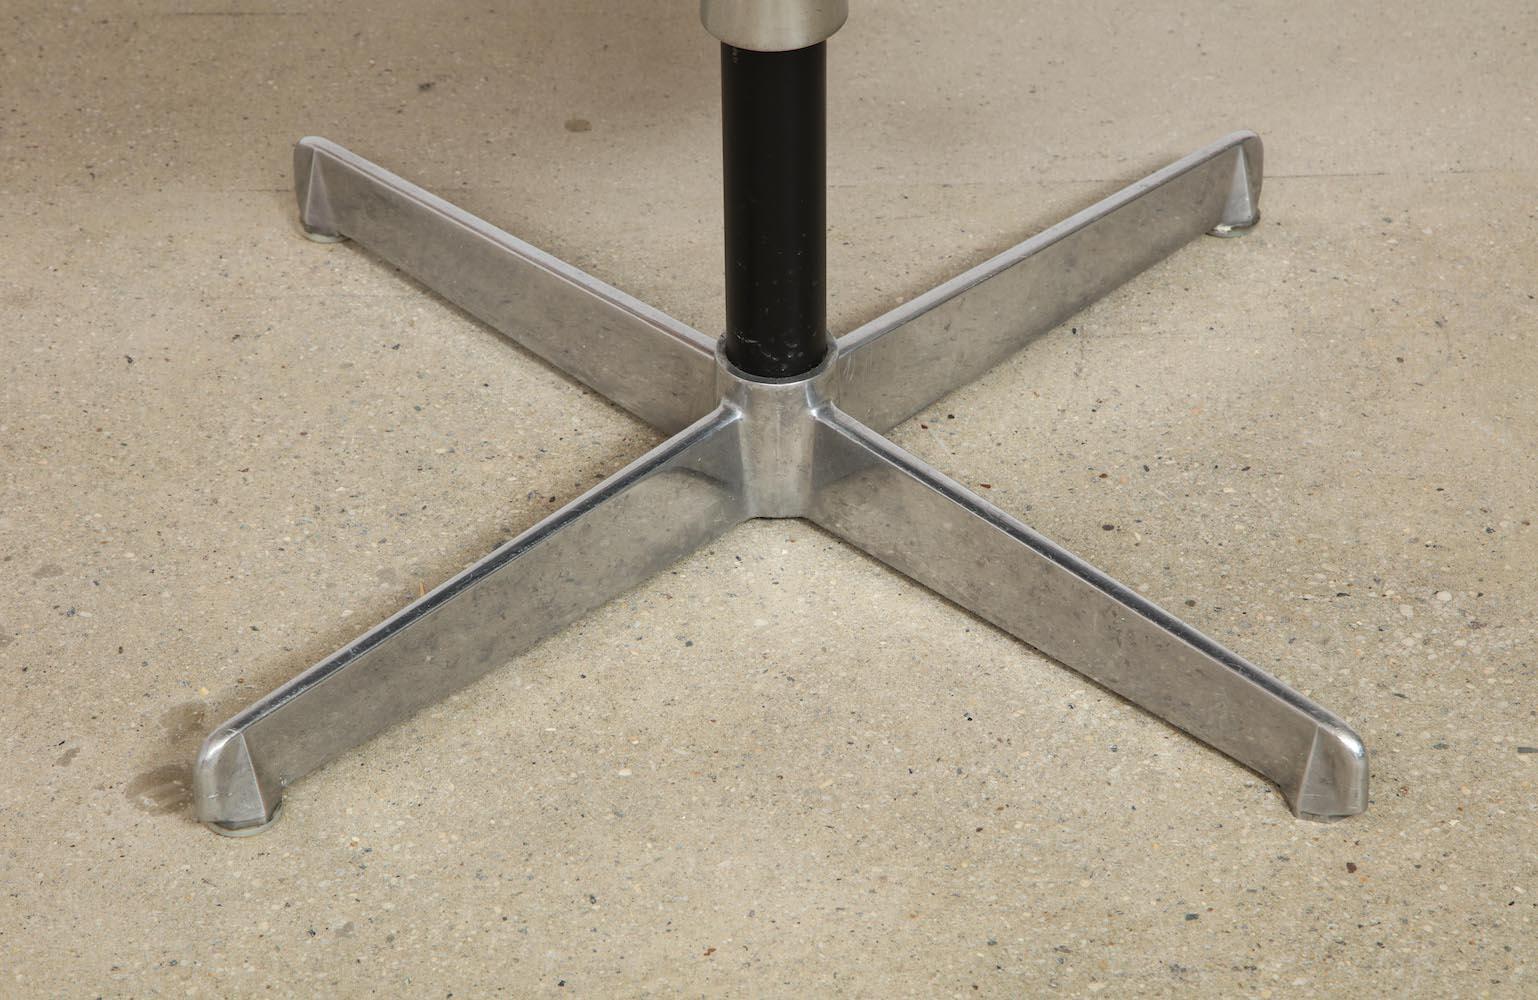 Ponti Arflex Chairs 6.jpg